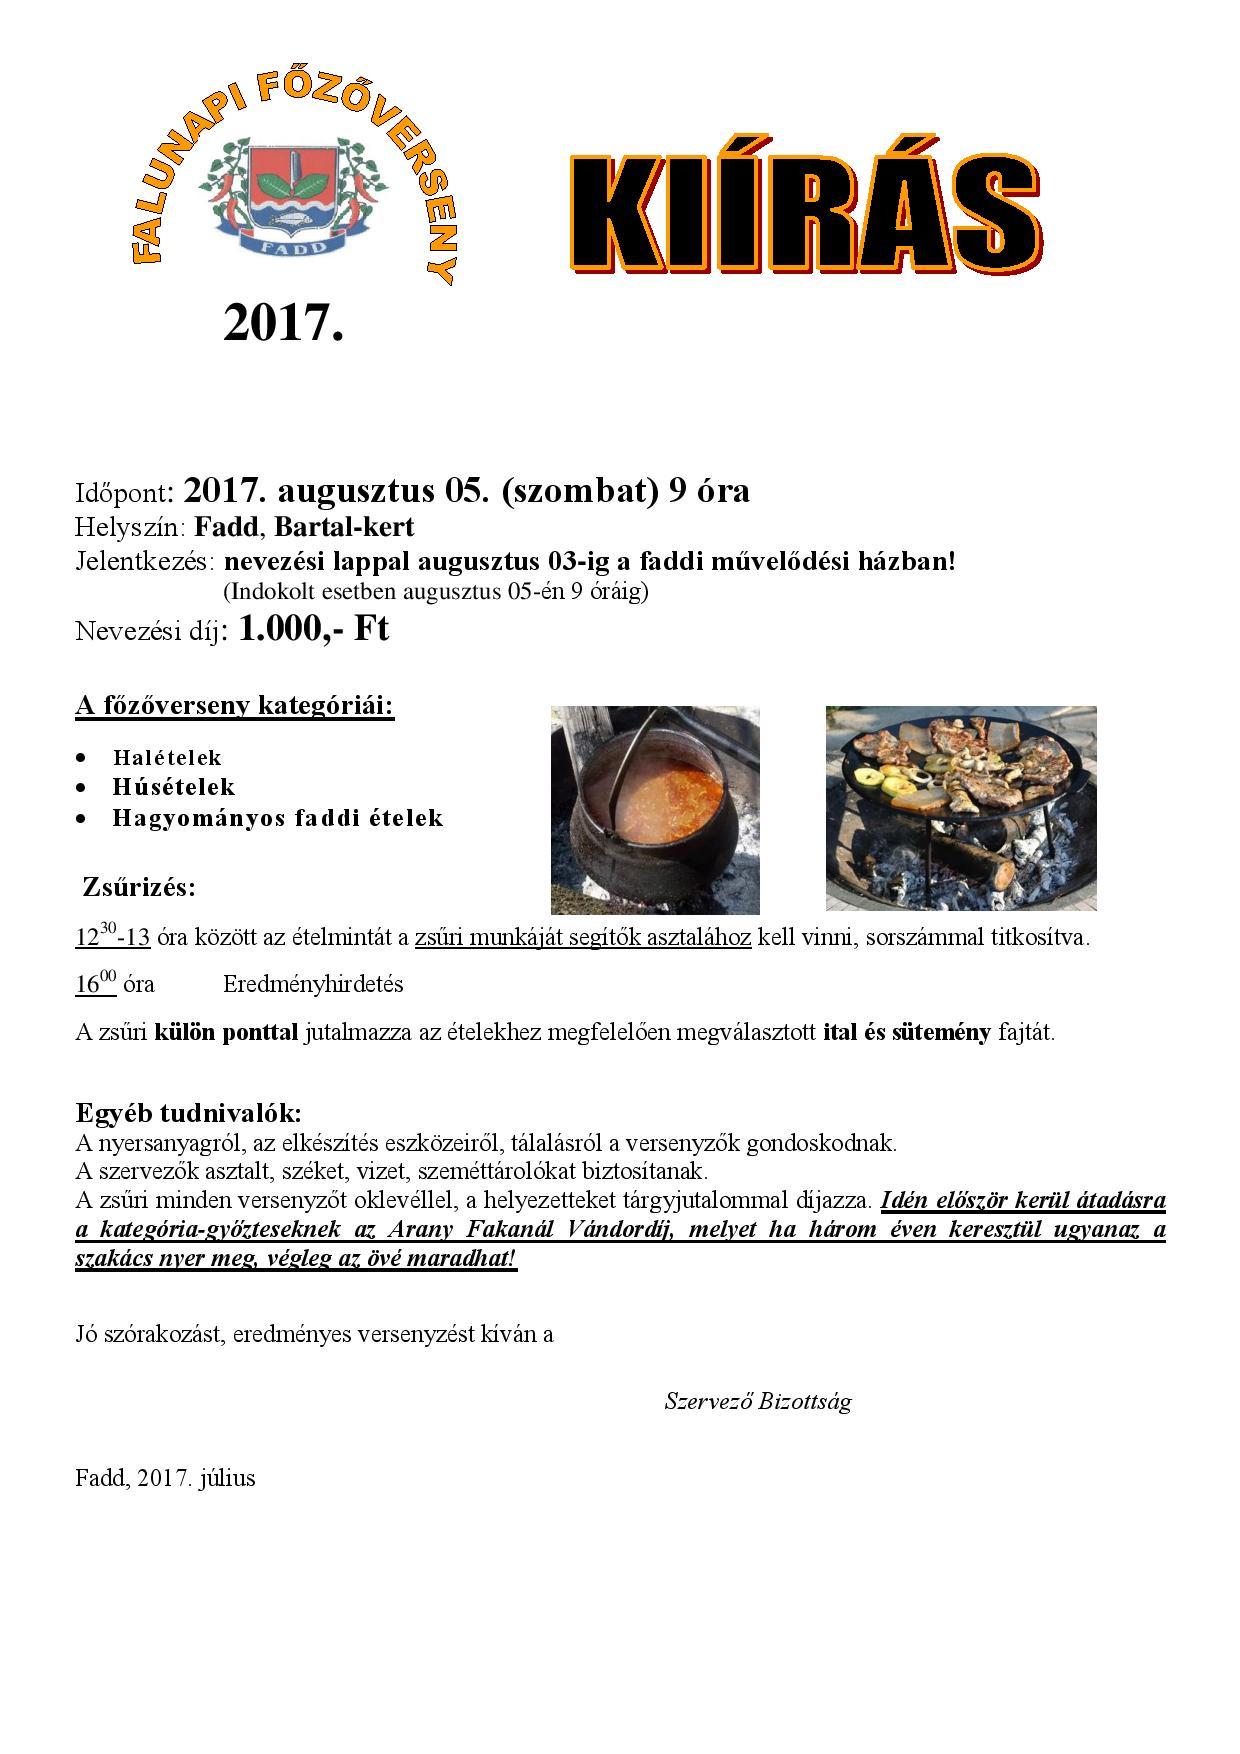 Falunapi főzőverseny kiírás